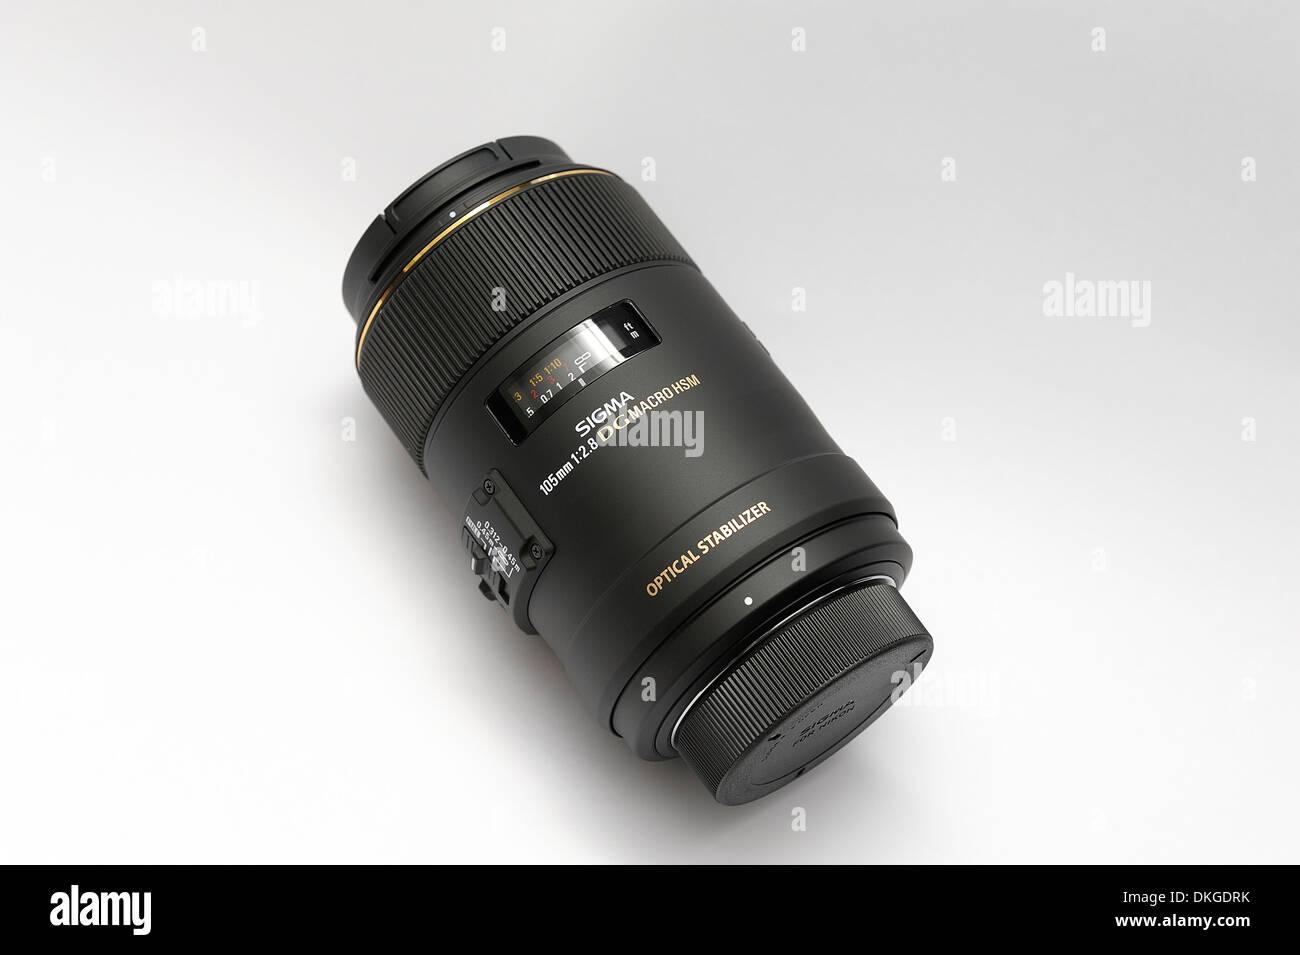 Nikon F2 Stock Photos Images Alamy Sigma 50mm F 28 Ex Dg Macro Canon 105mm F28 Os Hsm Fit Lens Image